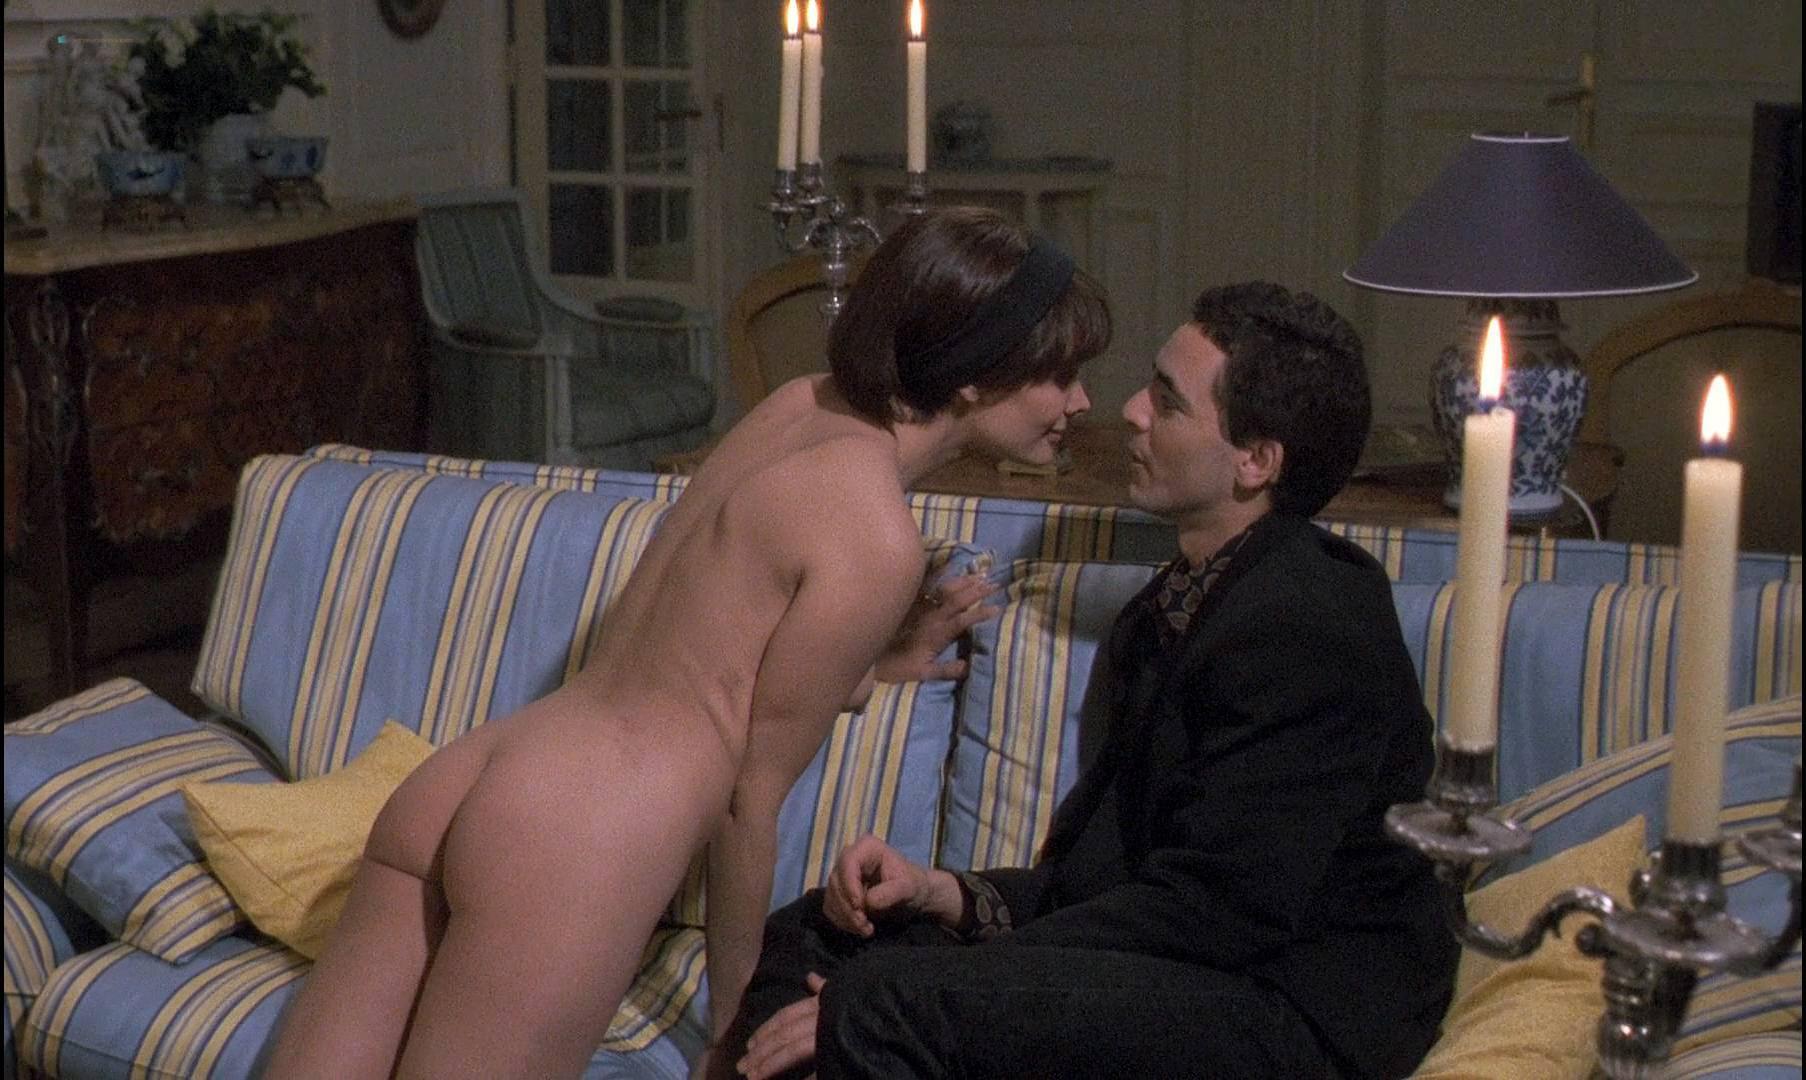 scarlett johansson frontal nude